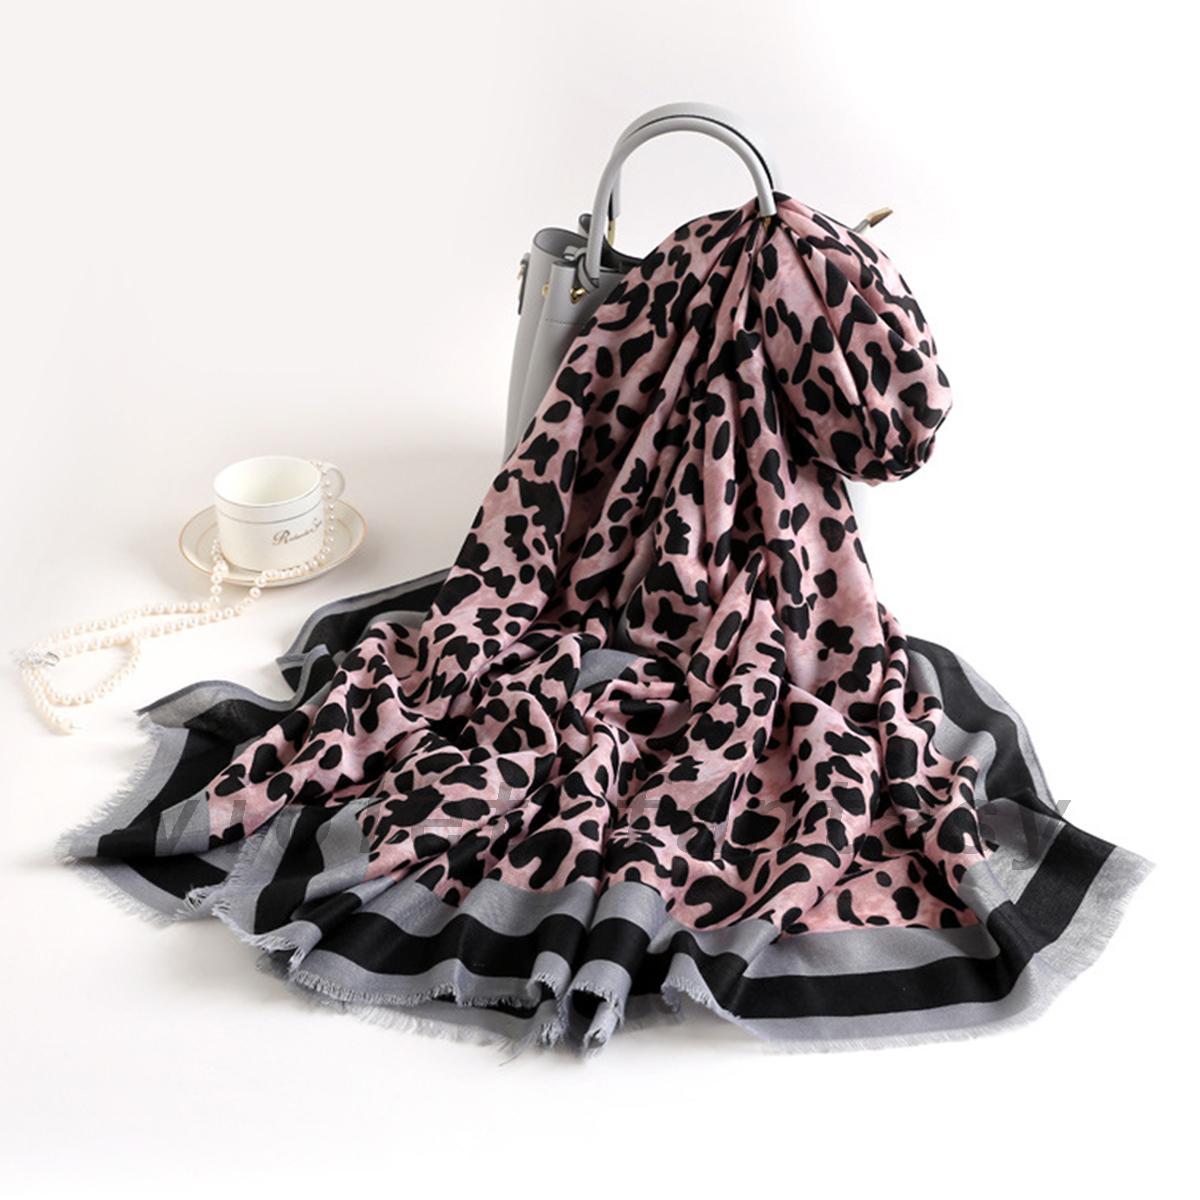 Harga Trend Baju Jumbo Leaf Uk L Purple PriceNia com Source · Fashion Women Leopard Print Scarf Pashmina Striped Border